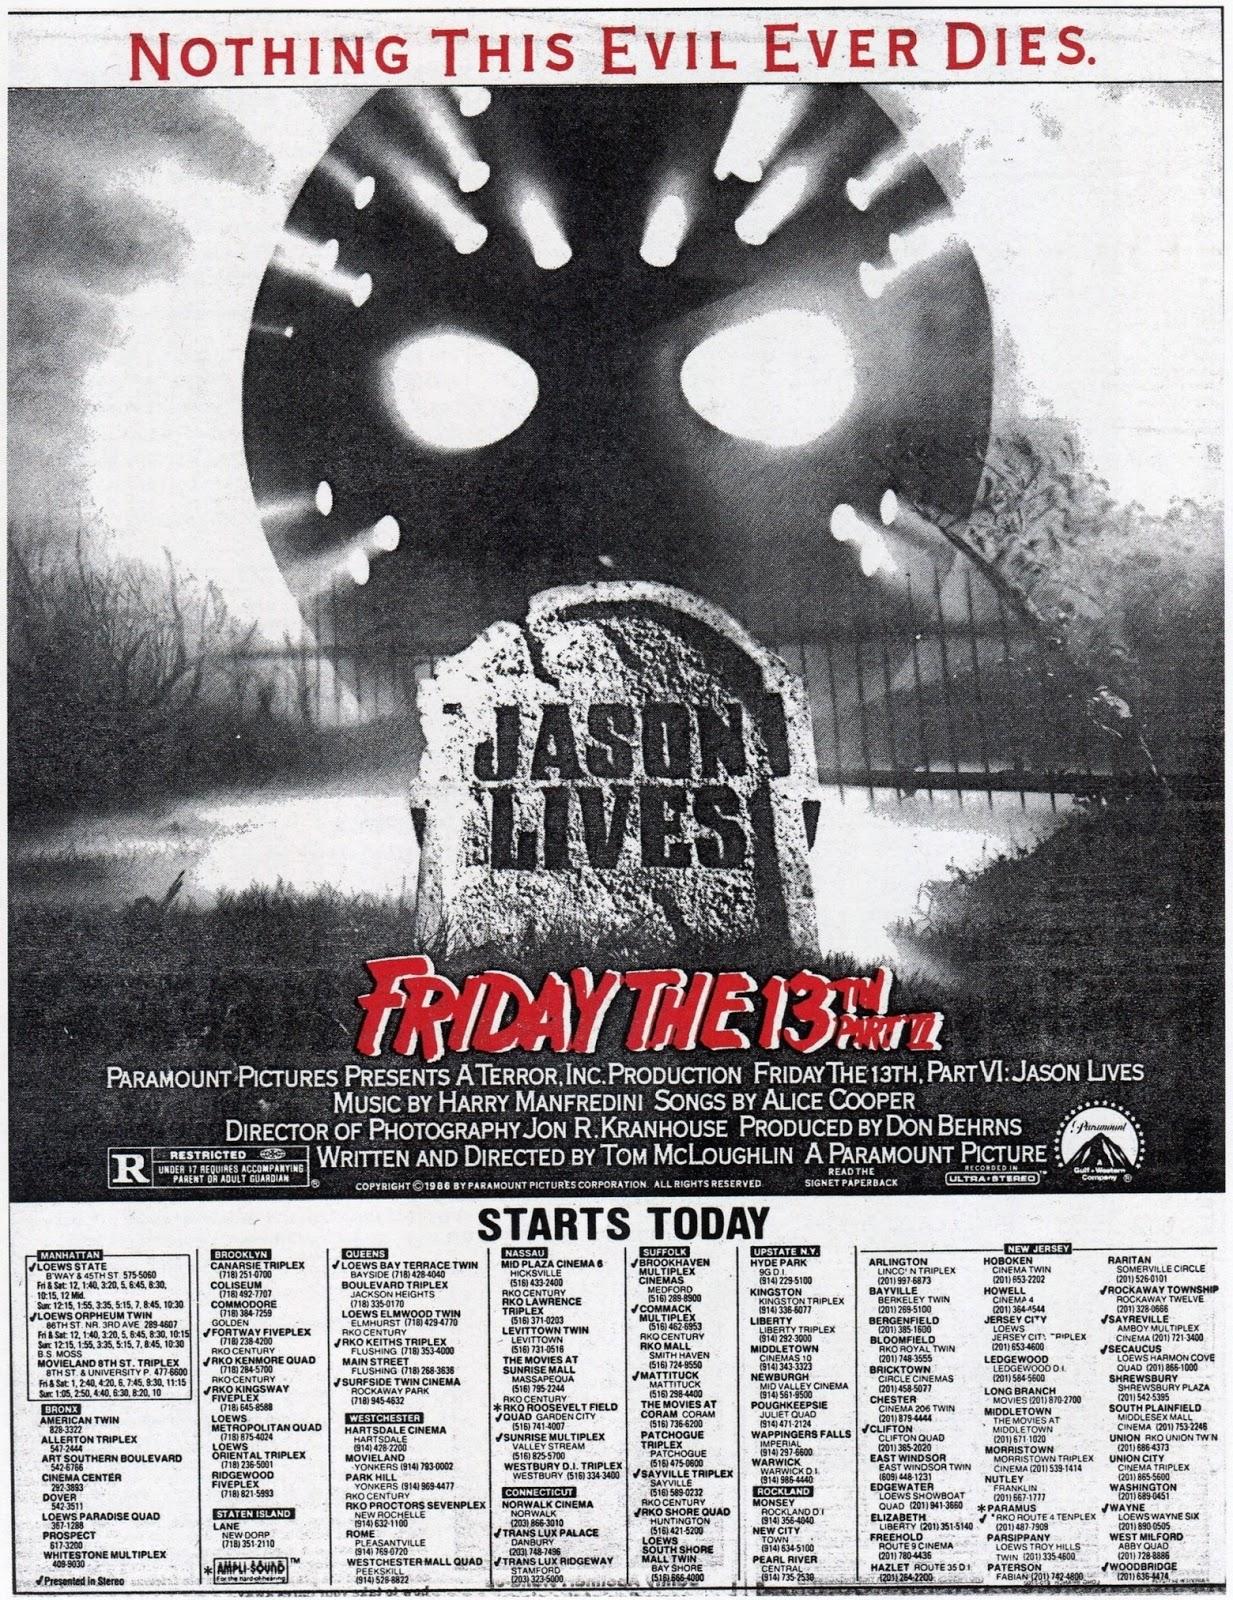 Jason Lives! theatre ad